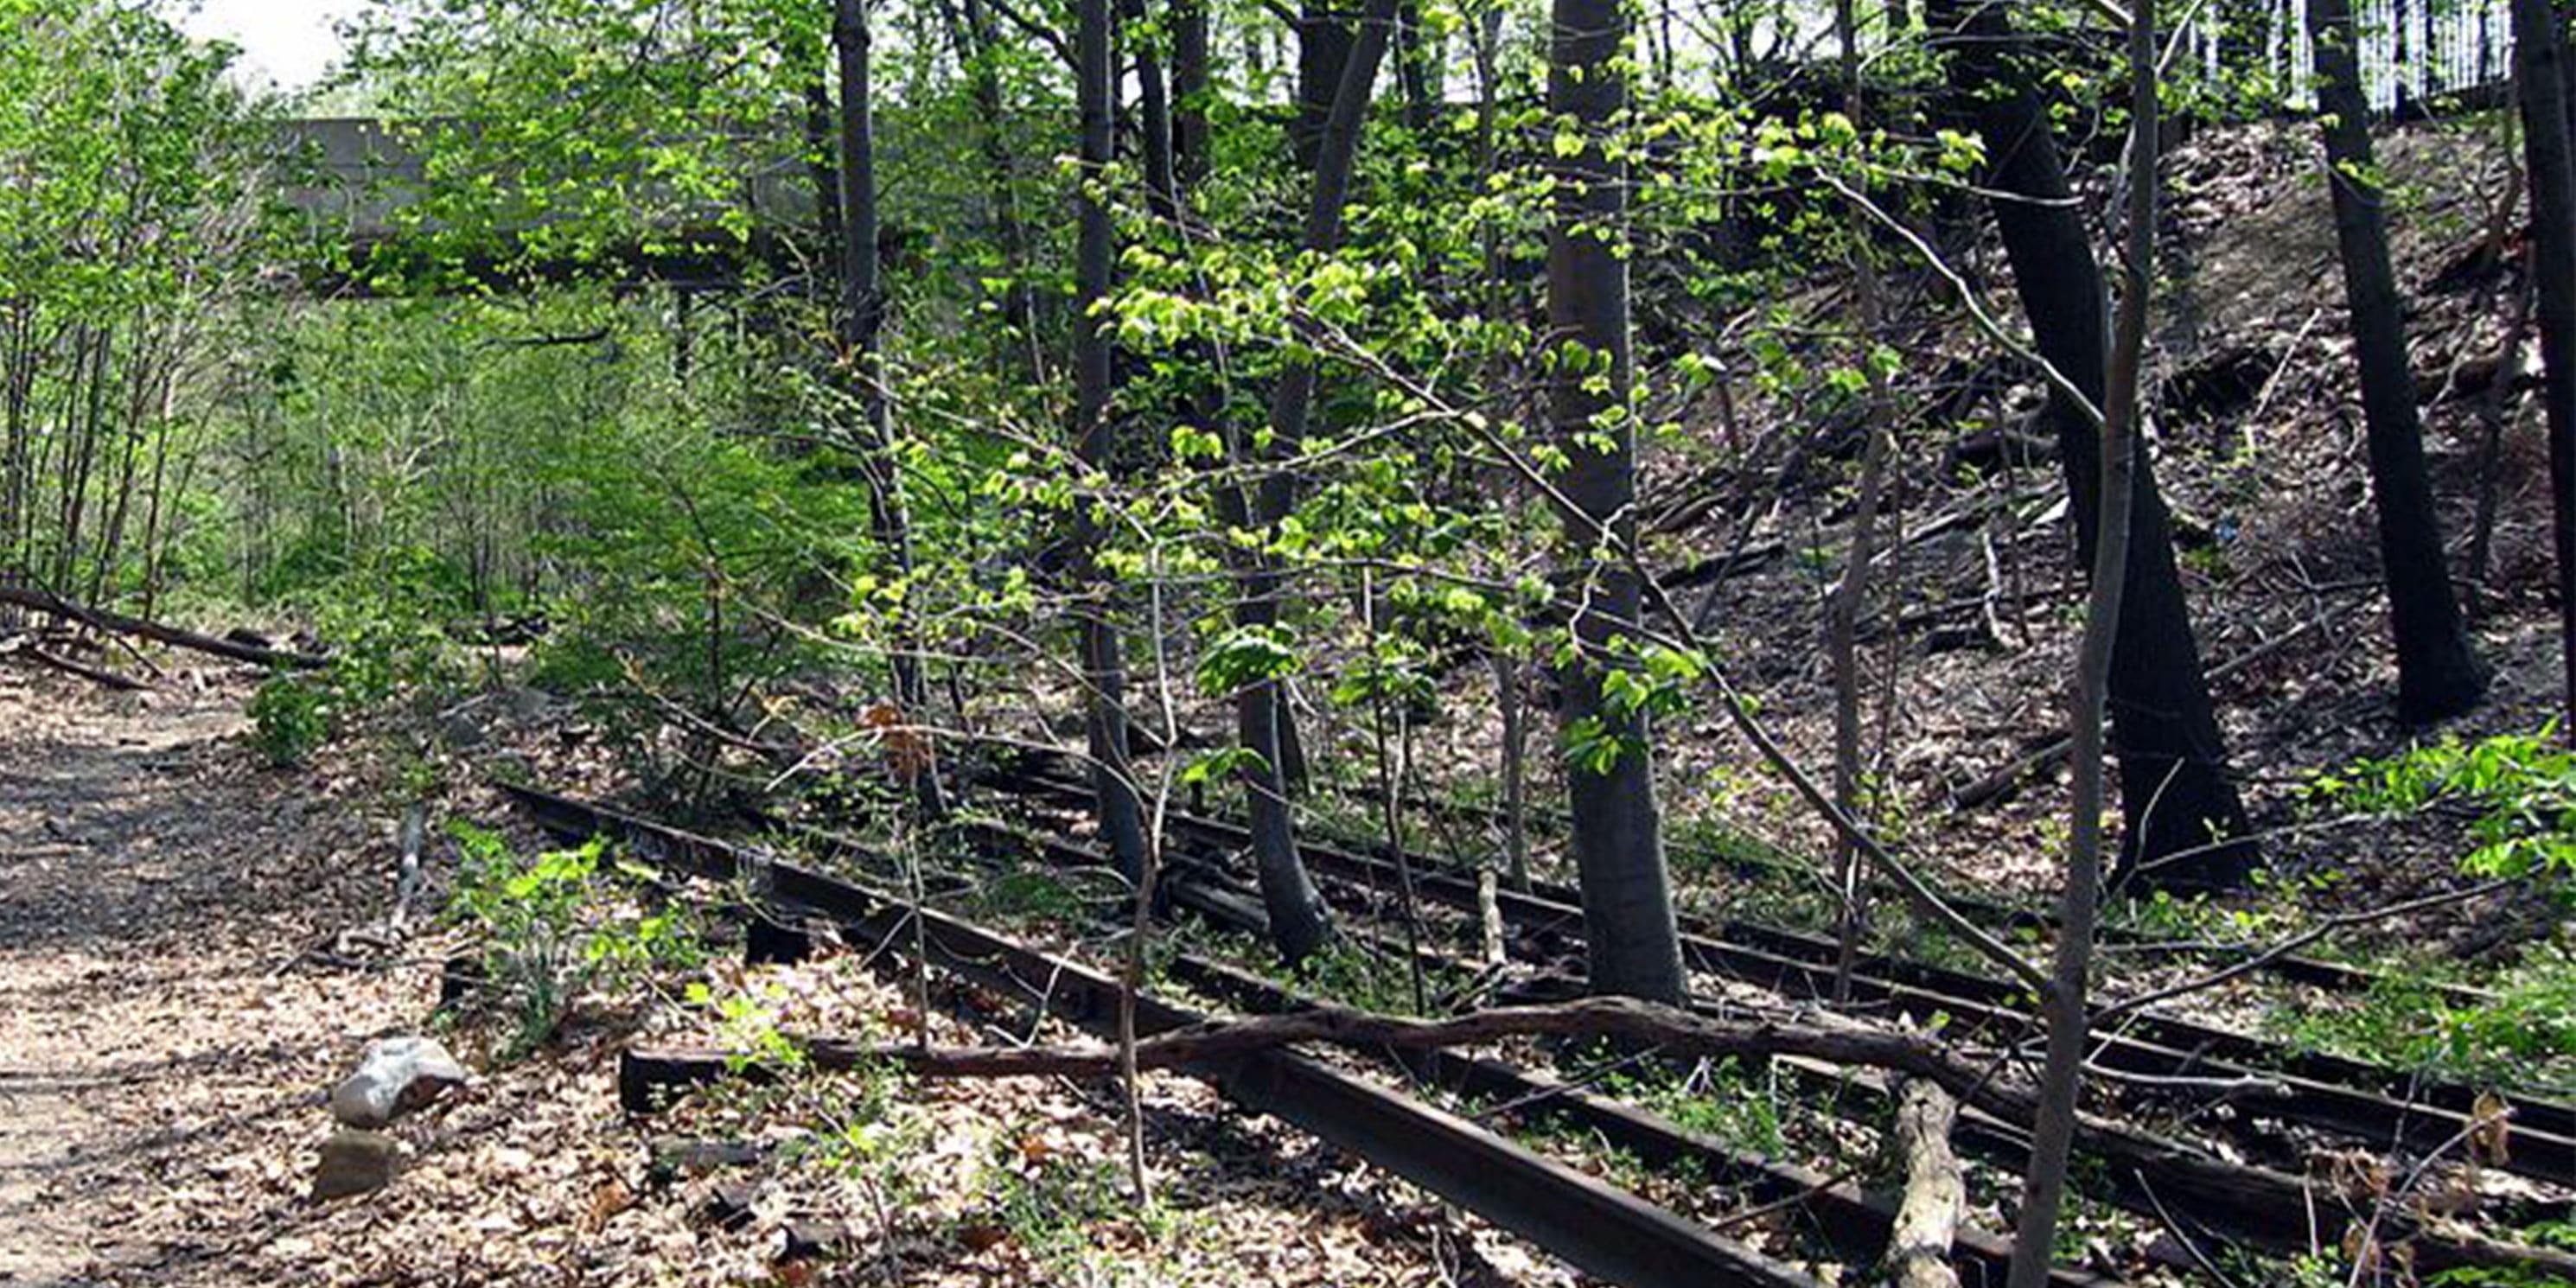 abandoned railroad tracks from the Long Island Railroad's Rockaway Beach Branch